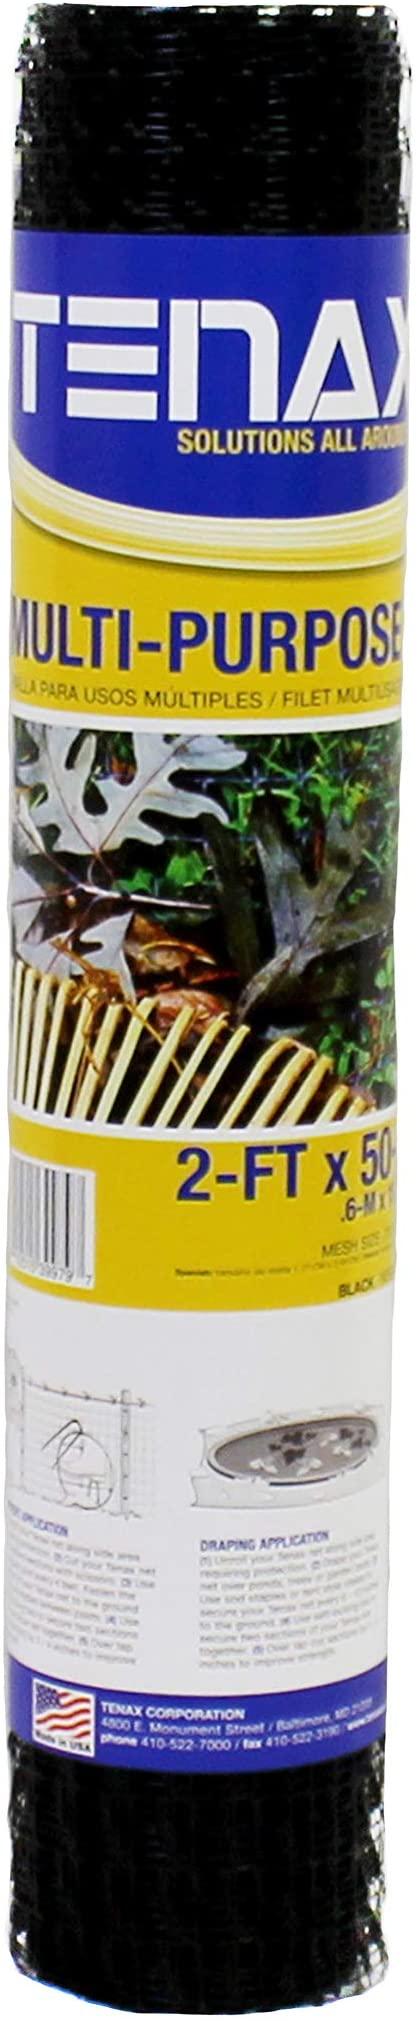 Tenax 60041909 product image 2